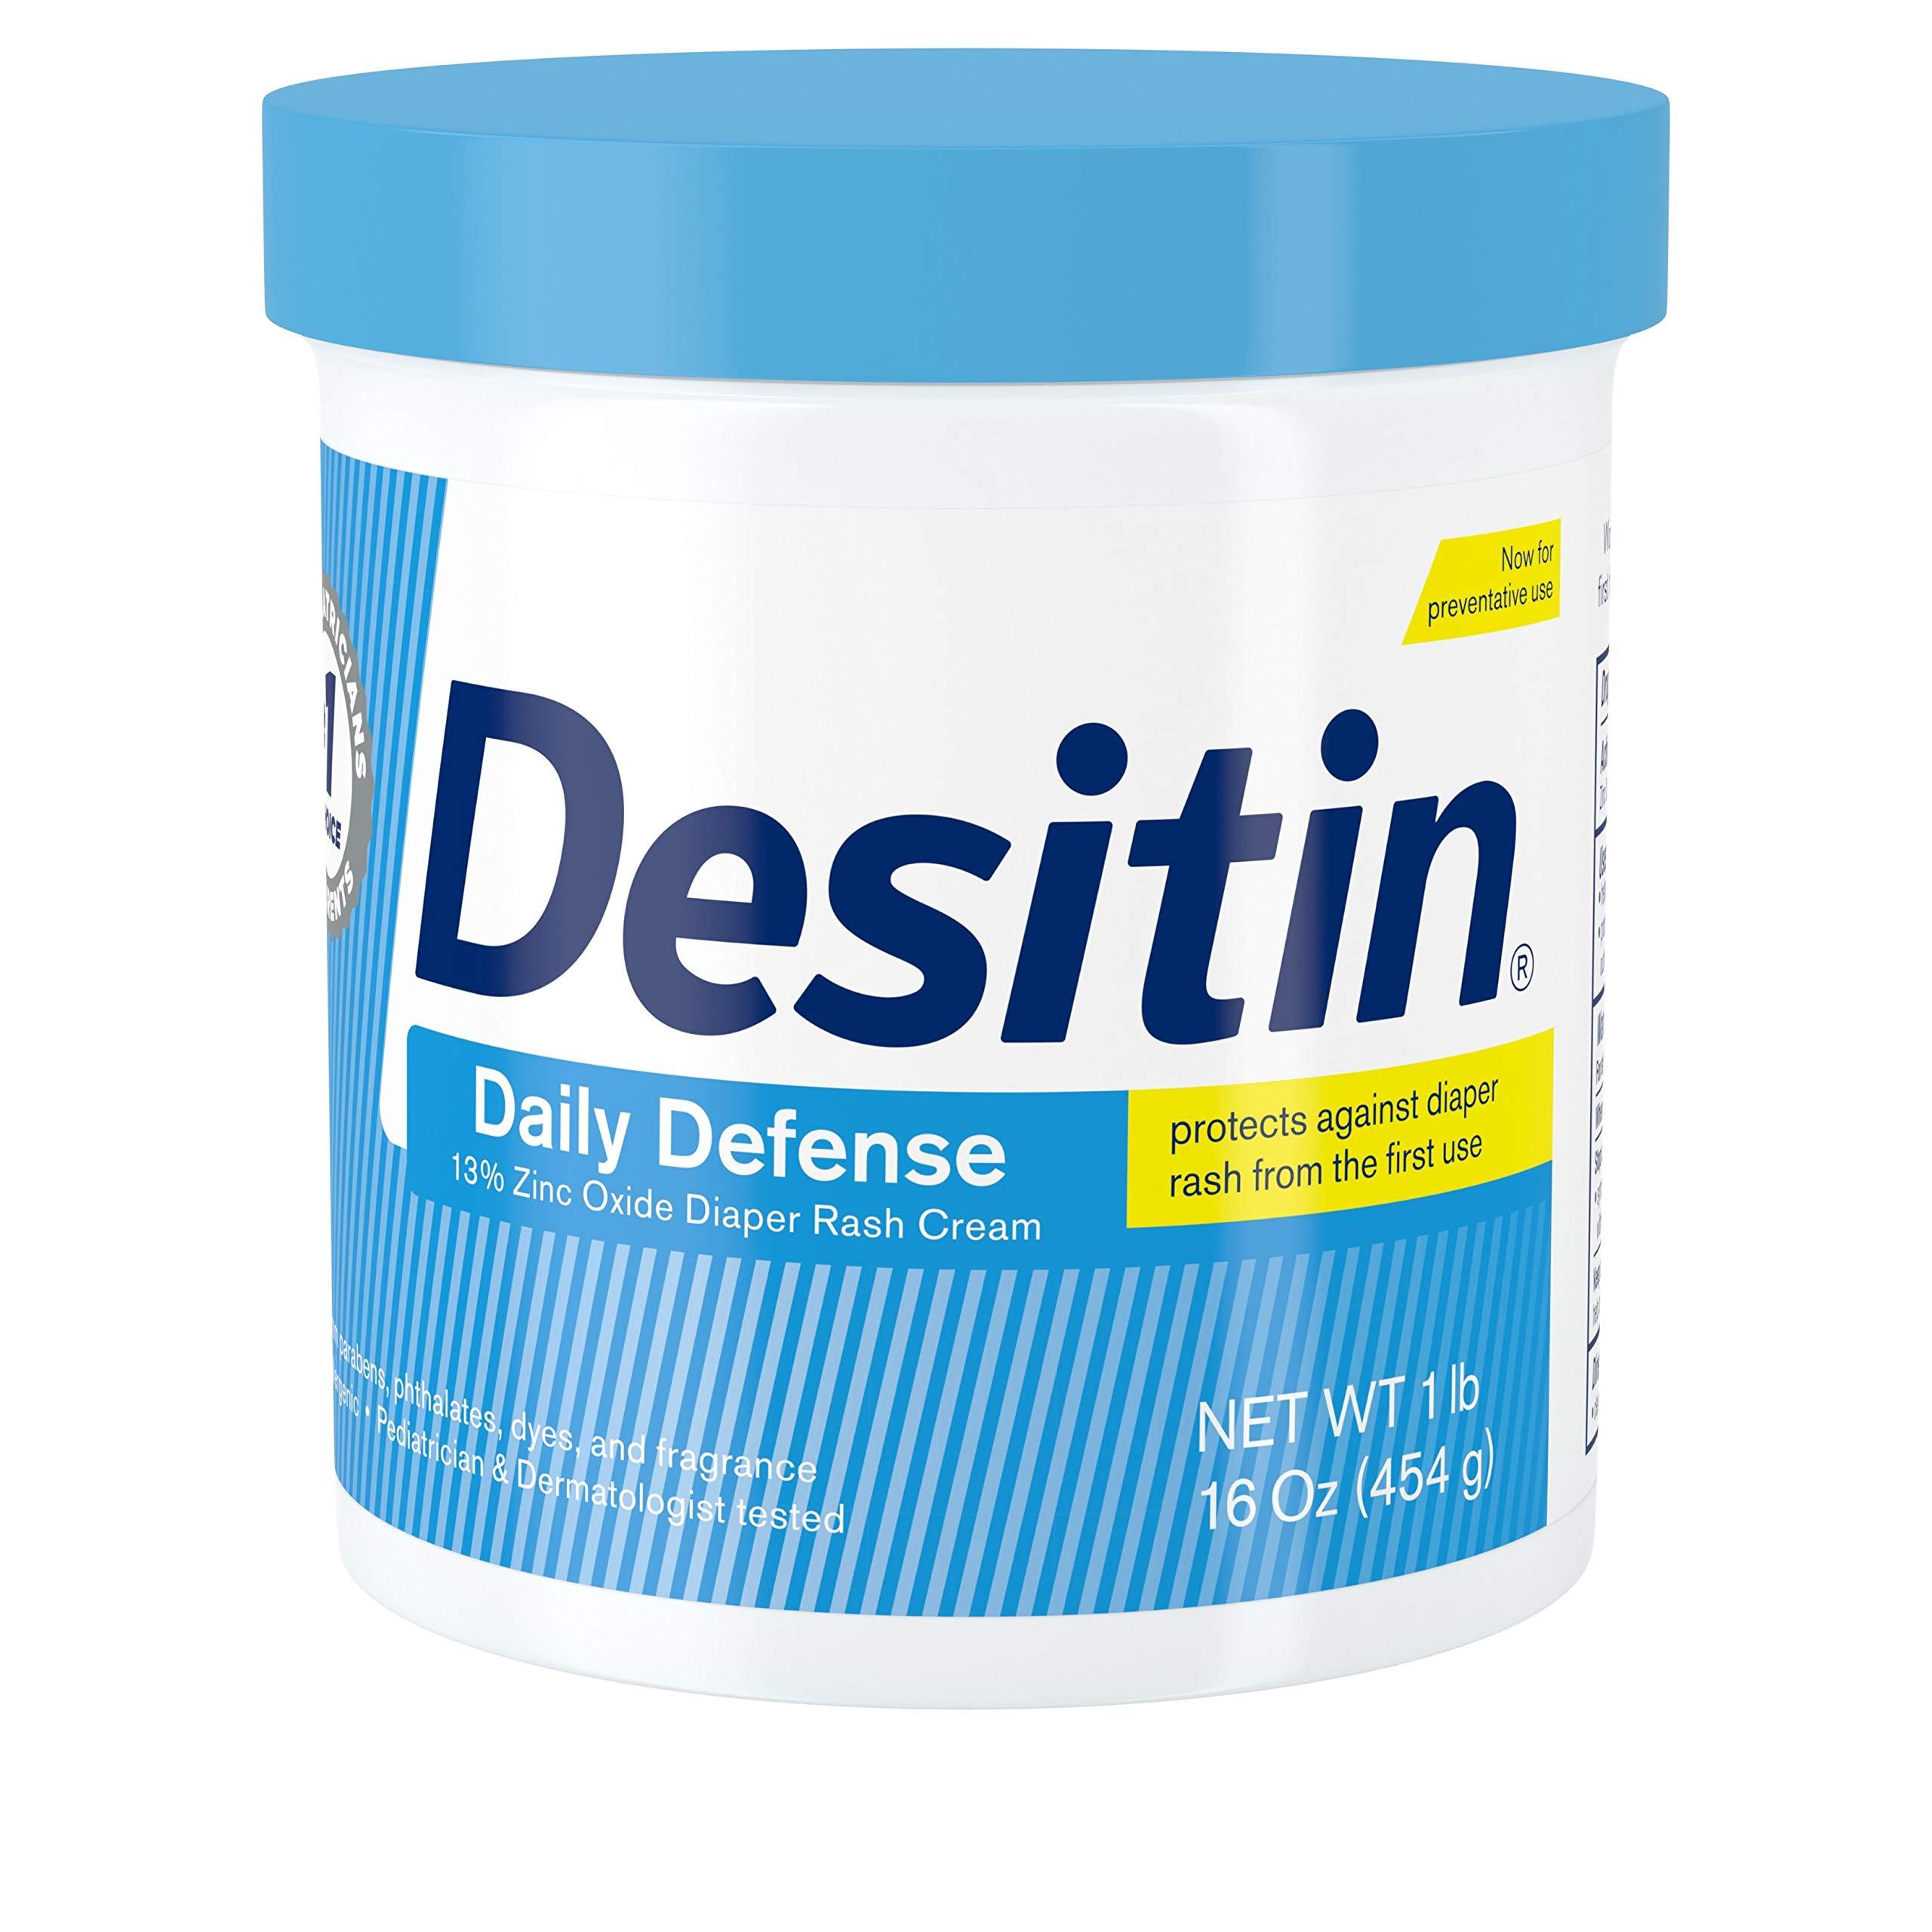 Desitin Daily Defense Baby Diaper Rash Cream with Zinc Oxide to Treat, Relieve & Prevent diaper rash, Hypoallergenic, Dye-, Phthalate- & Paraben-Free, 16 oz, Ivory